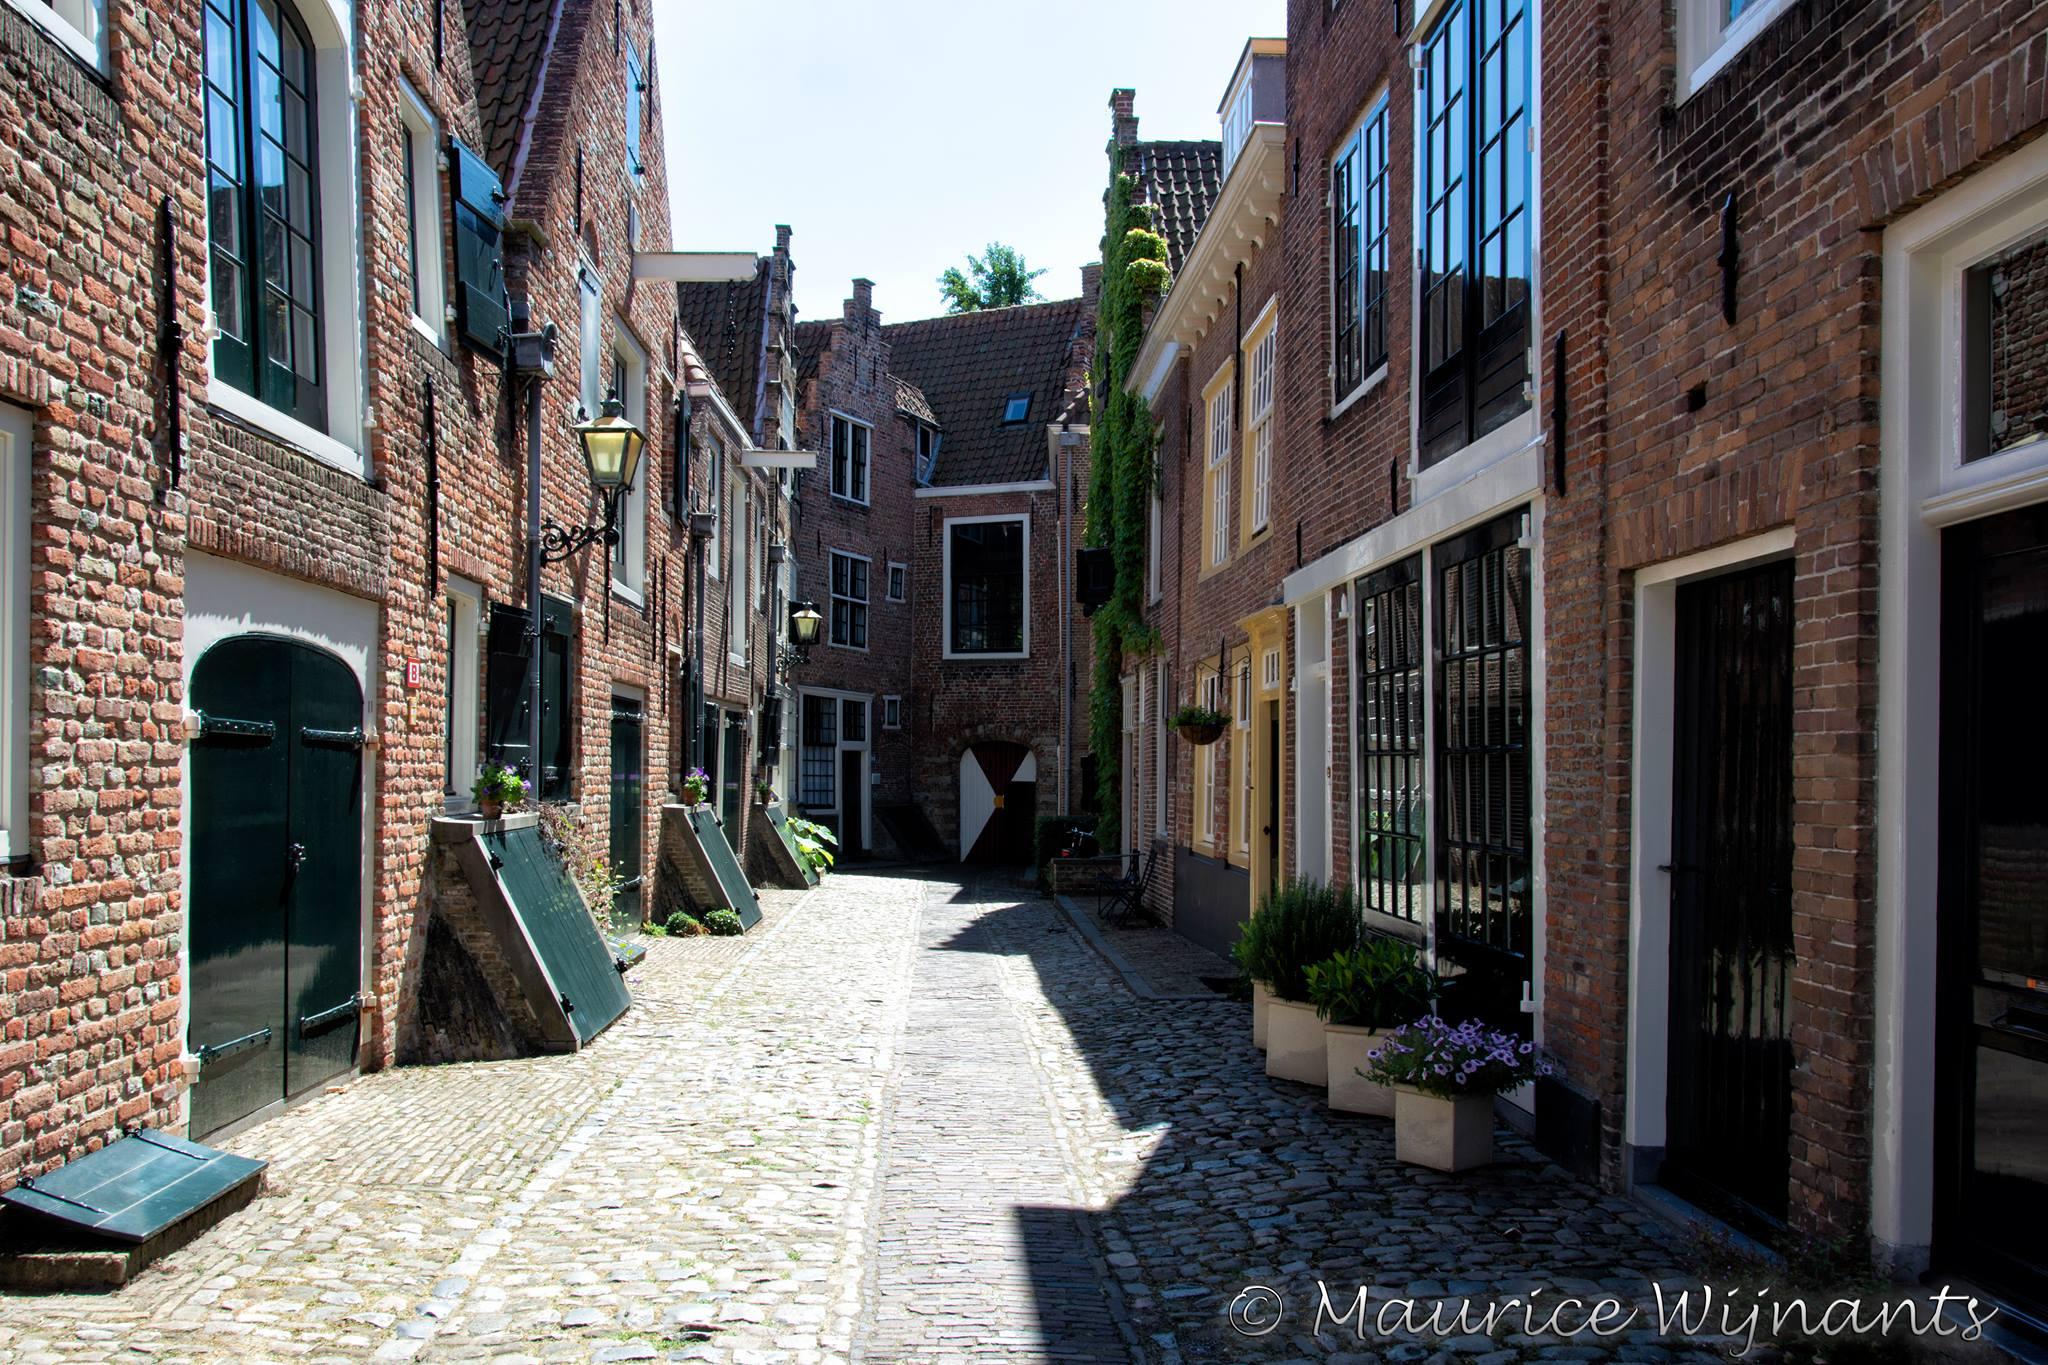 Kuiperspoort, Netherlands